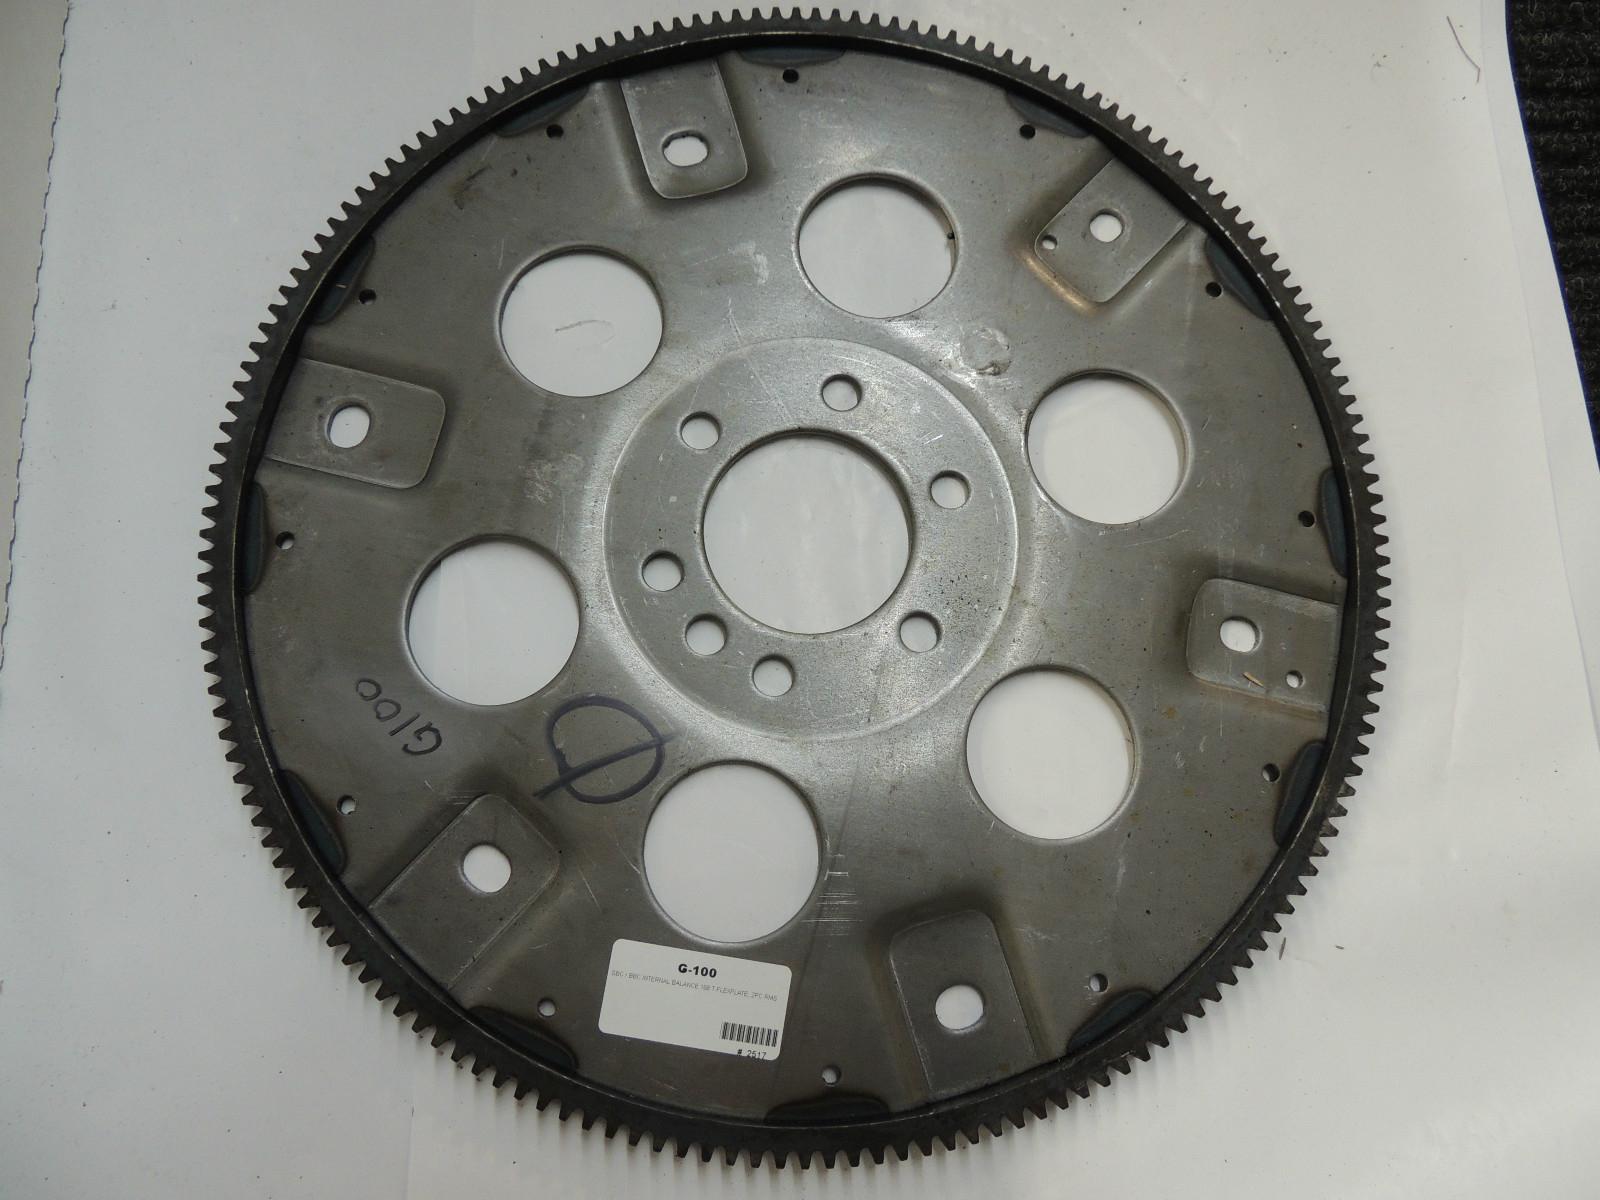 Flywheel Flexplate G100 Chevy 350 Motor 14 18 Inch Diameter